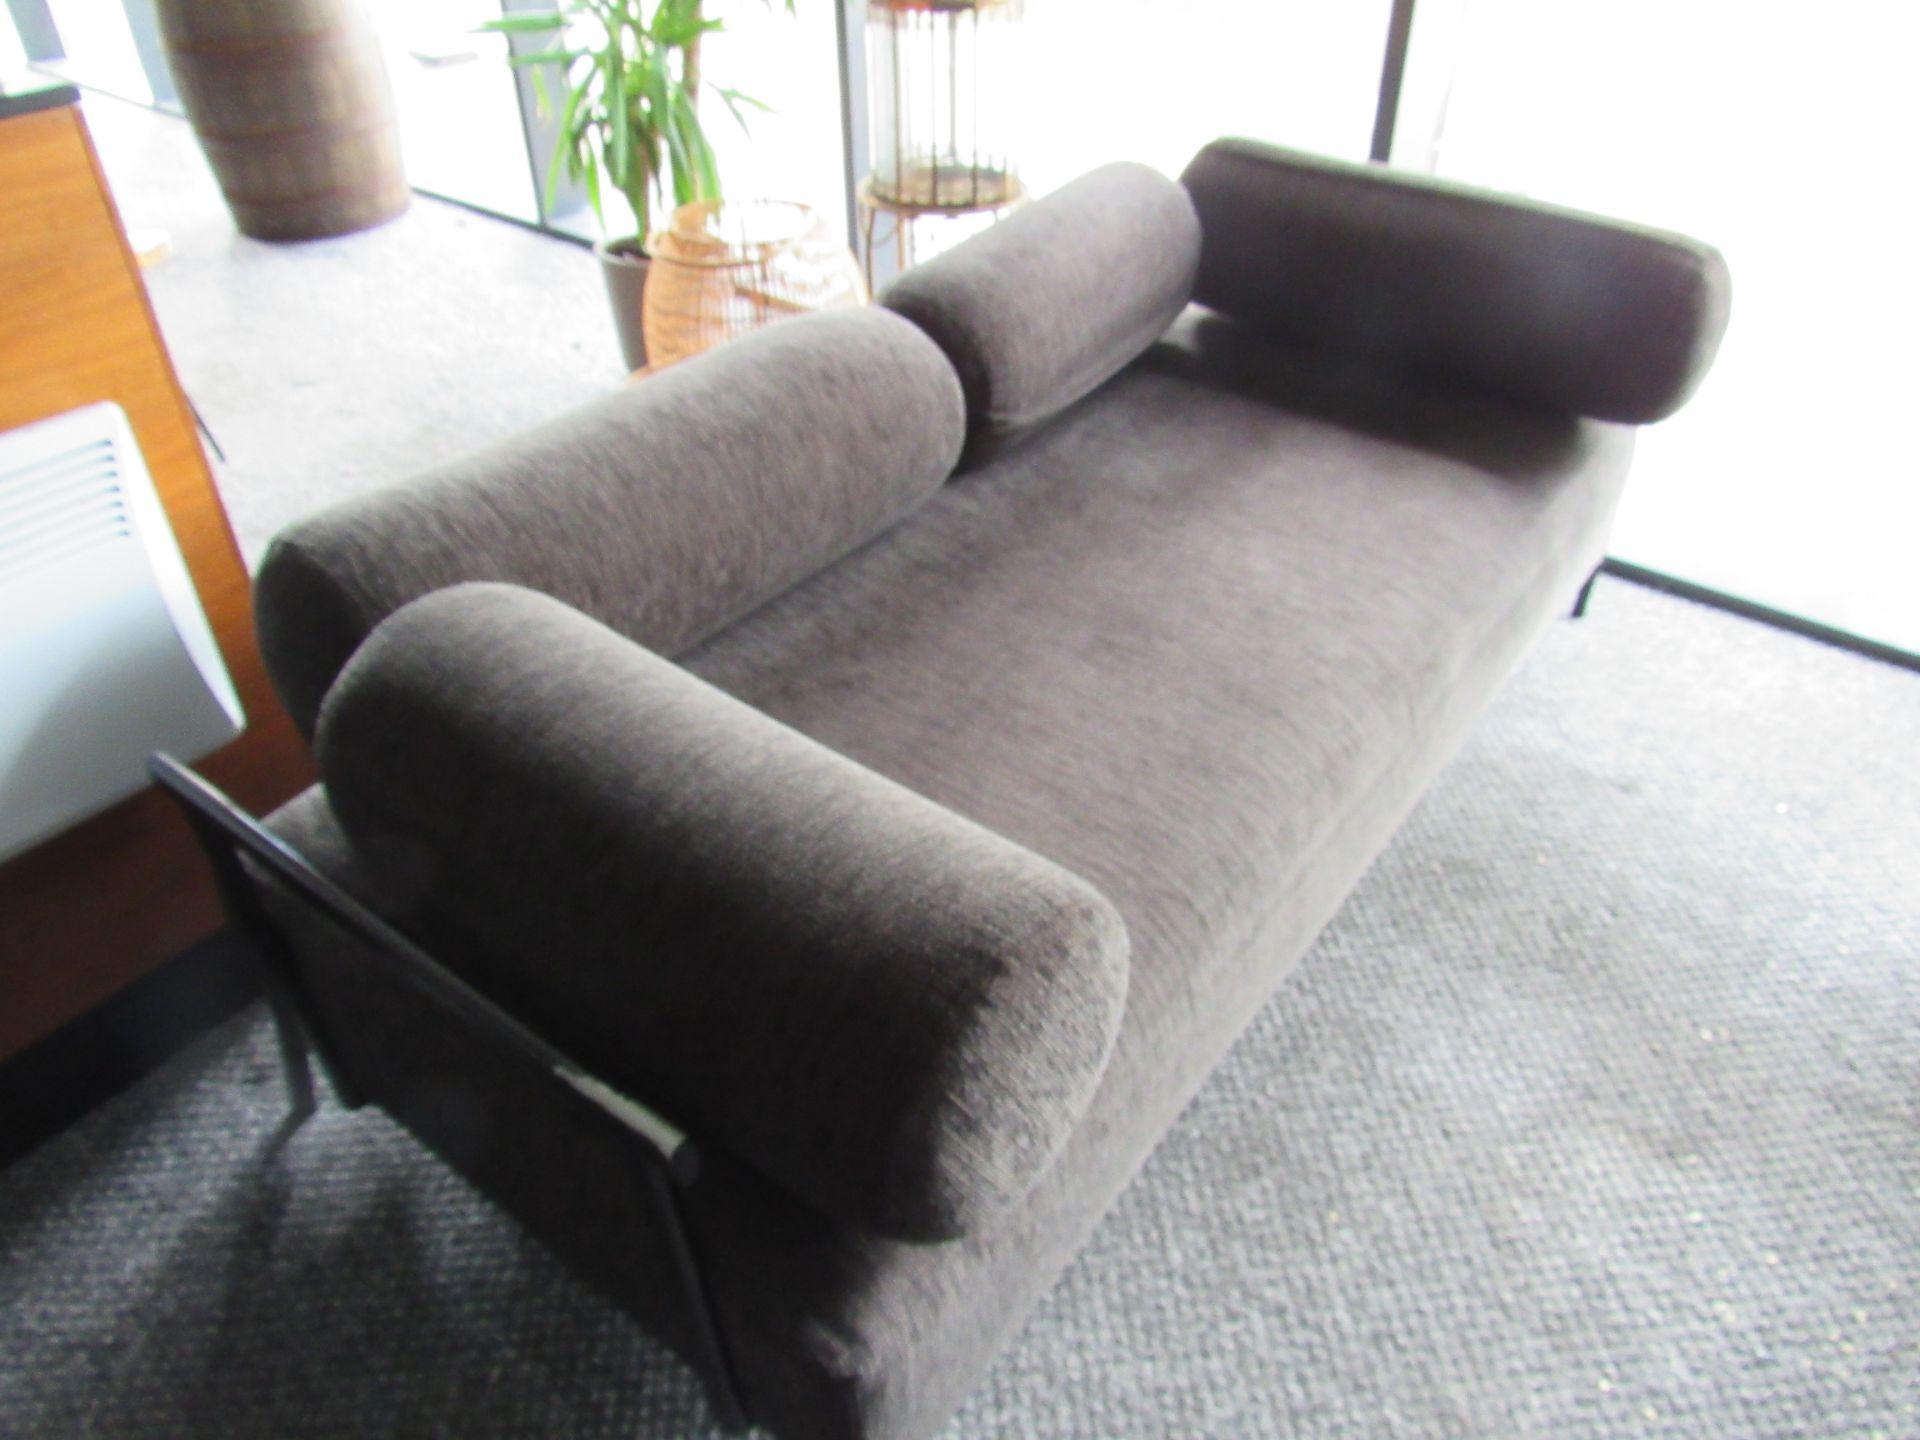 2 Steel Framed Upholstered Sofas - Image 4 of 4